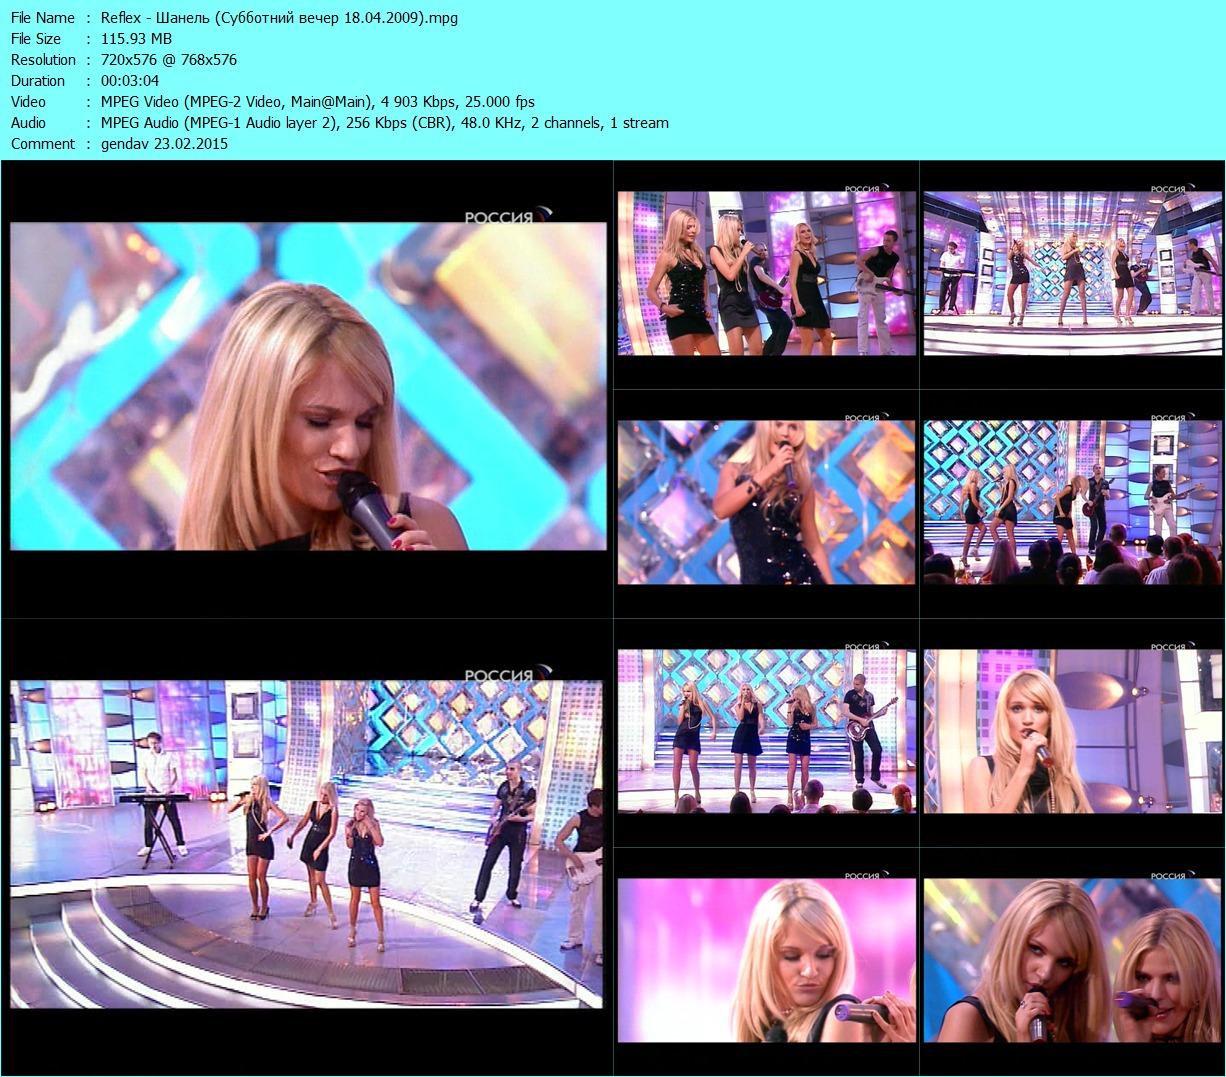 http://4put.ru/pictures/max/1092/3355858.jpg